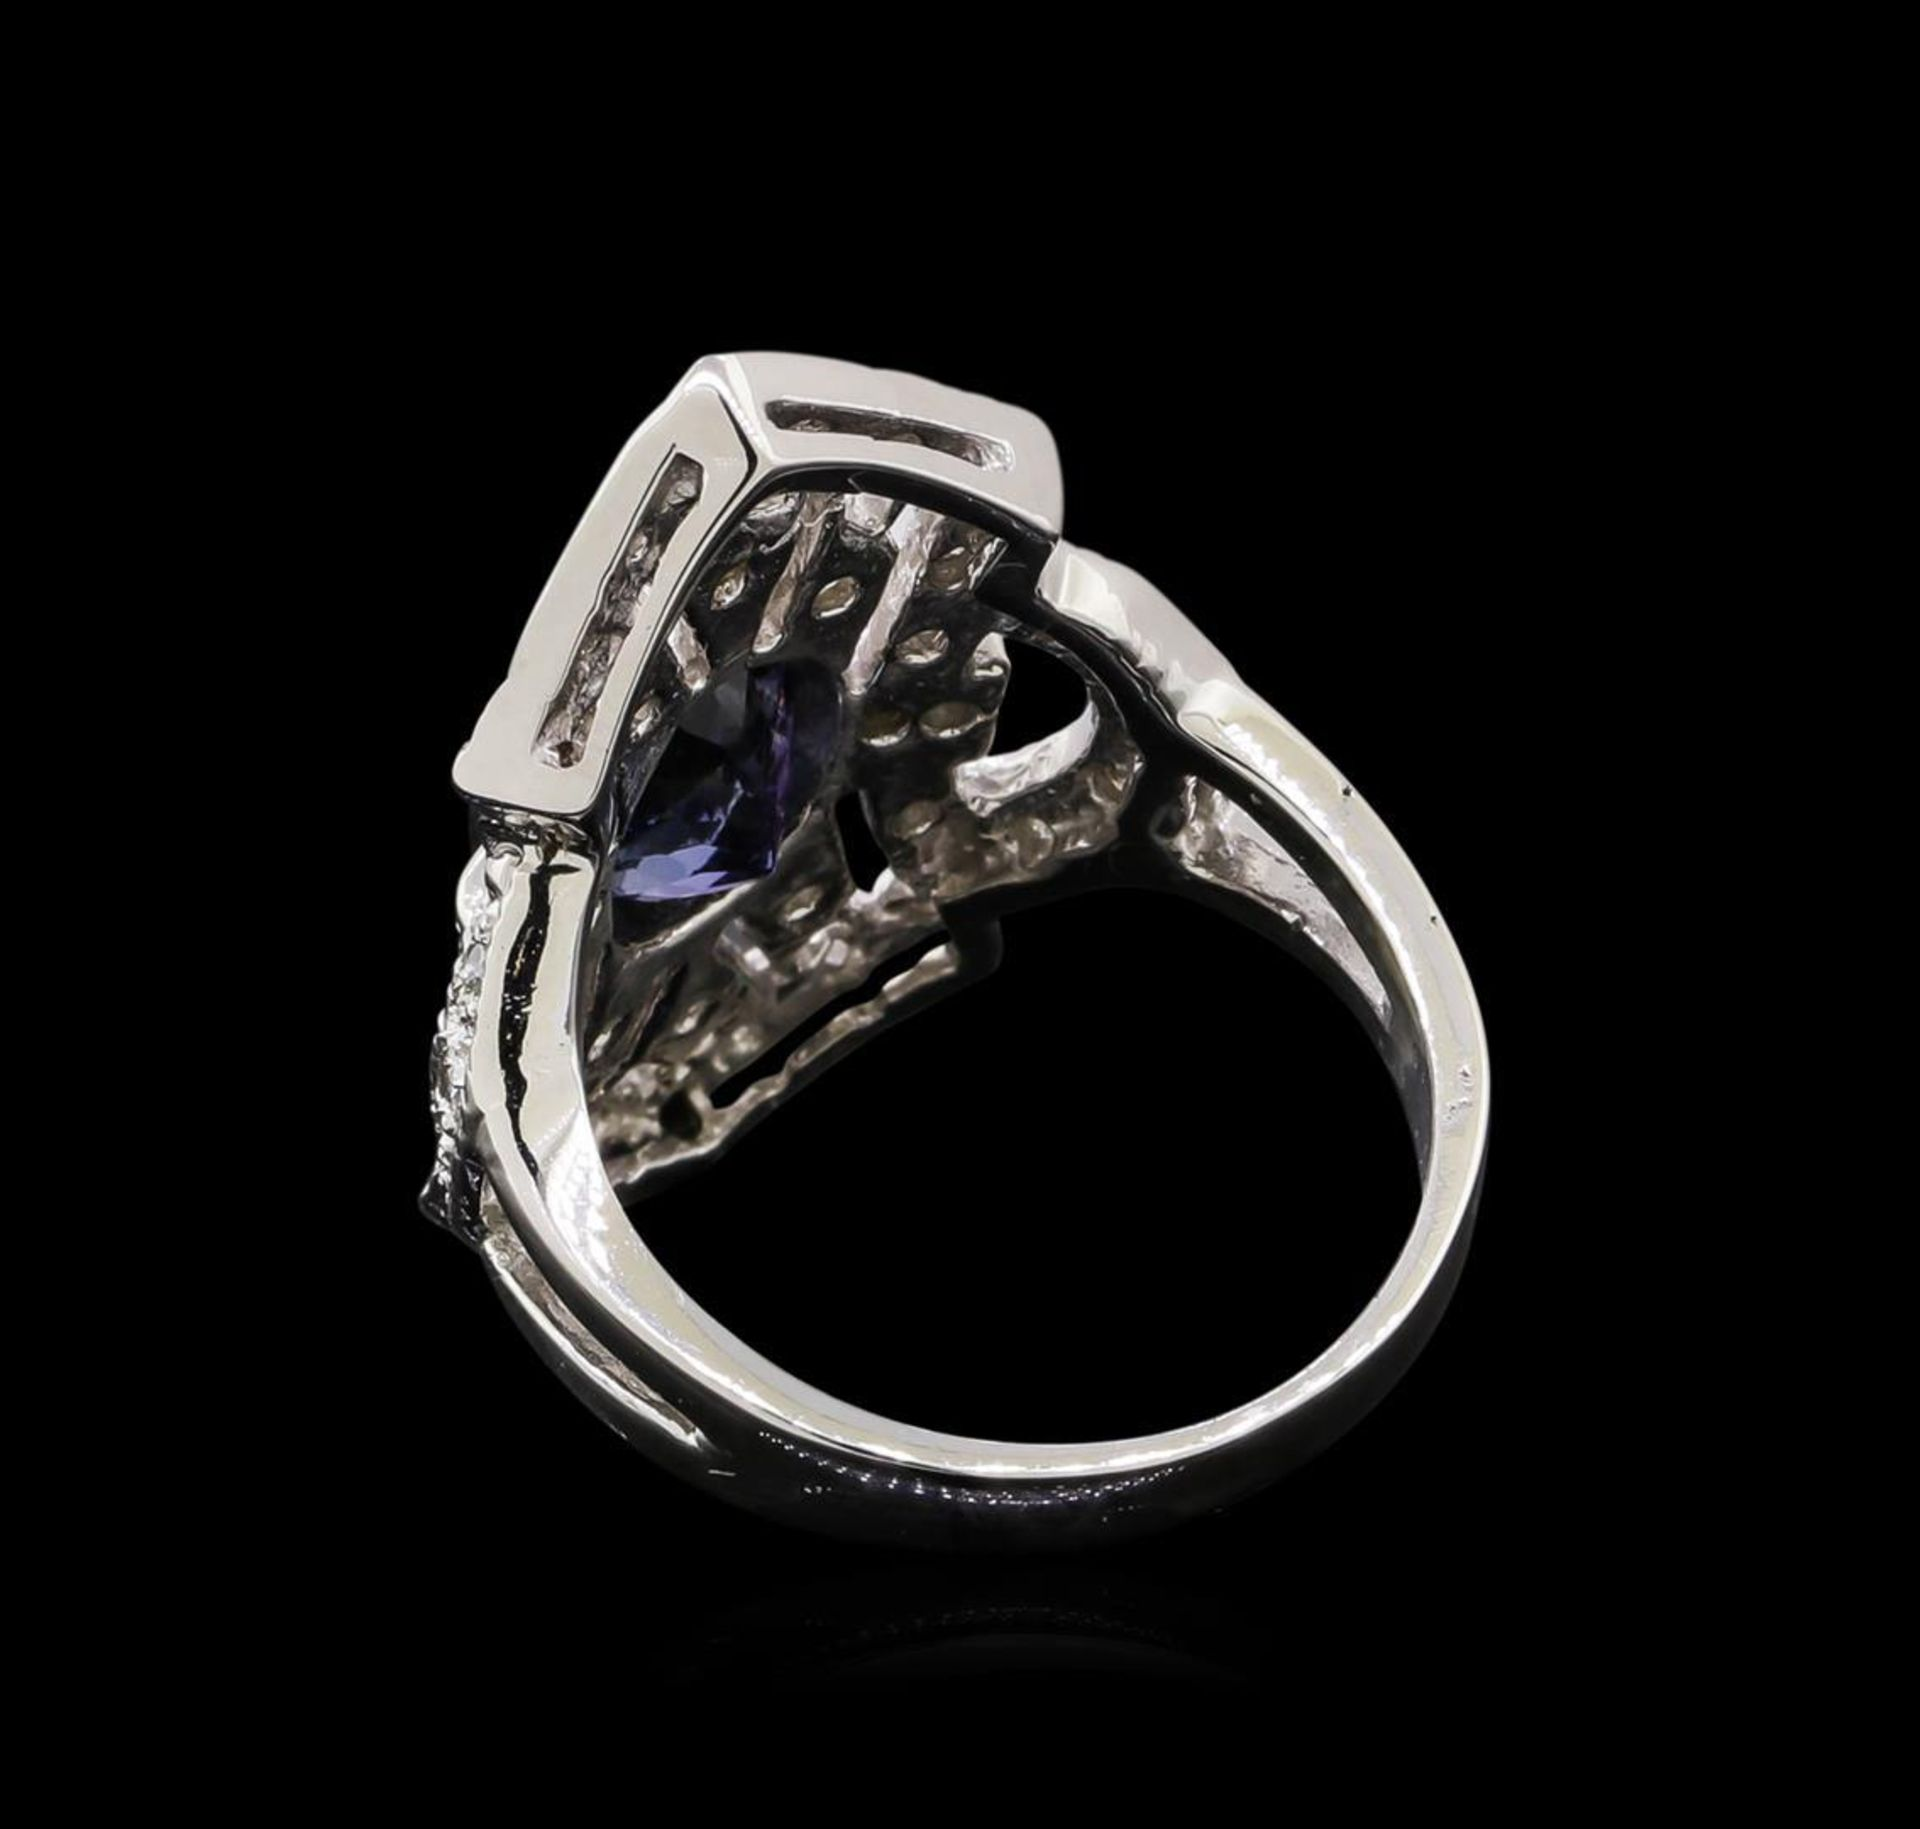 1.84 ctw Tanzanite and Diamond Ring - 14KT White Gold - Image 3 of 5